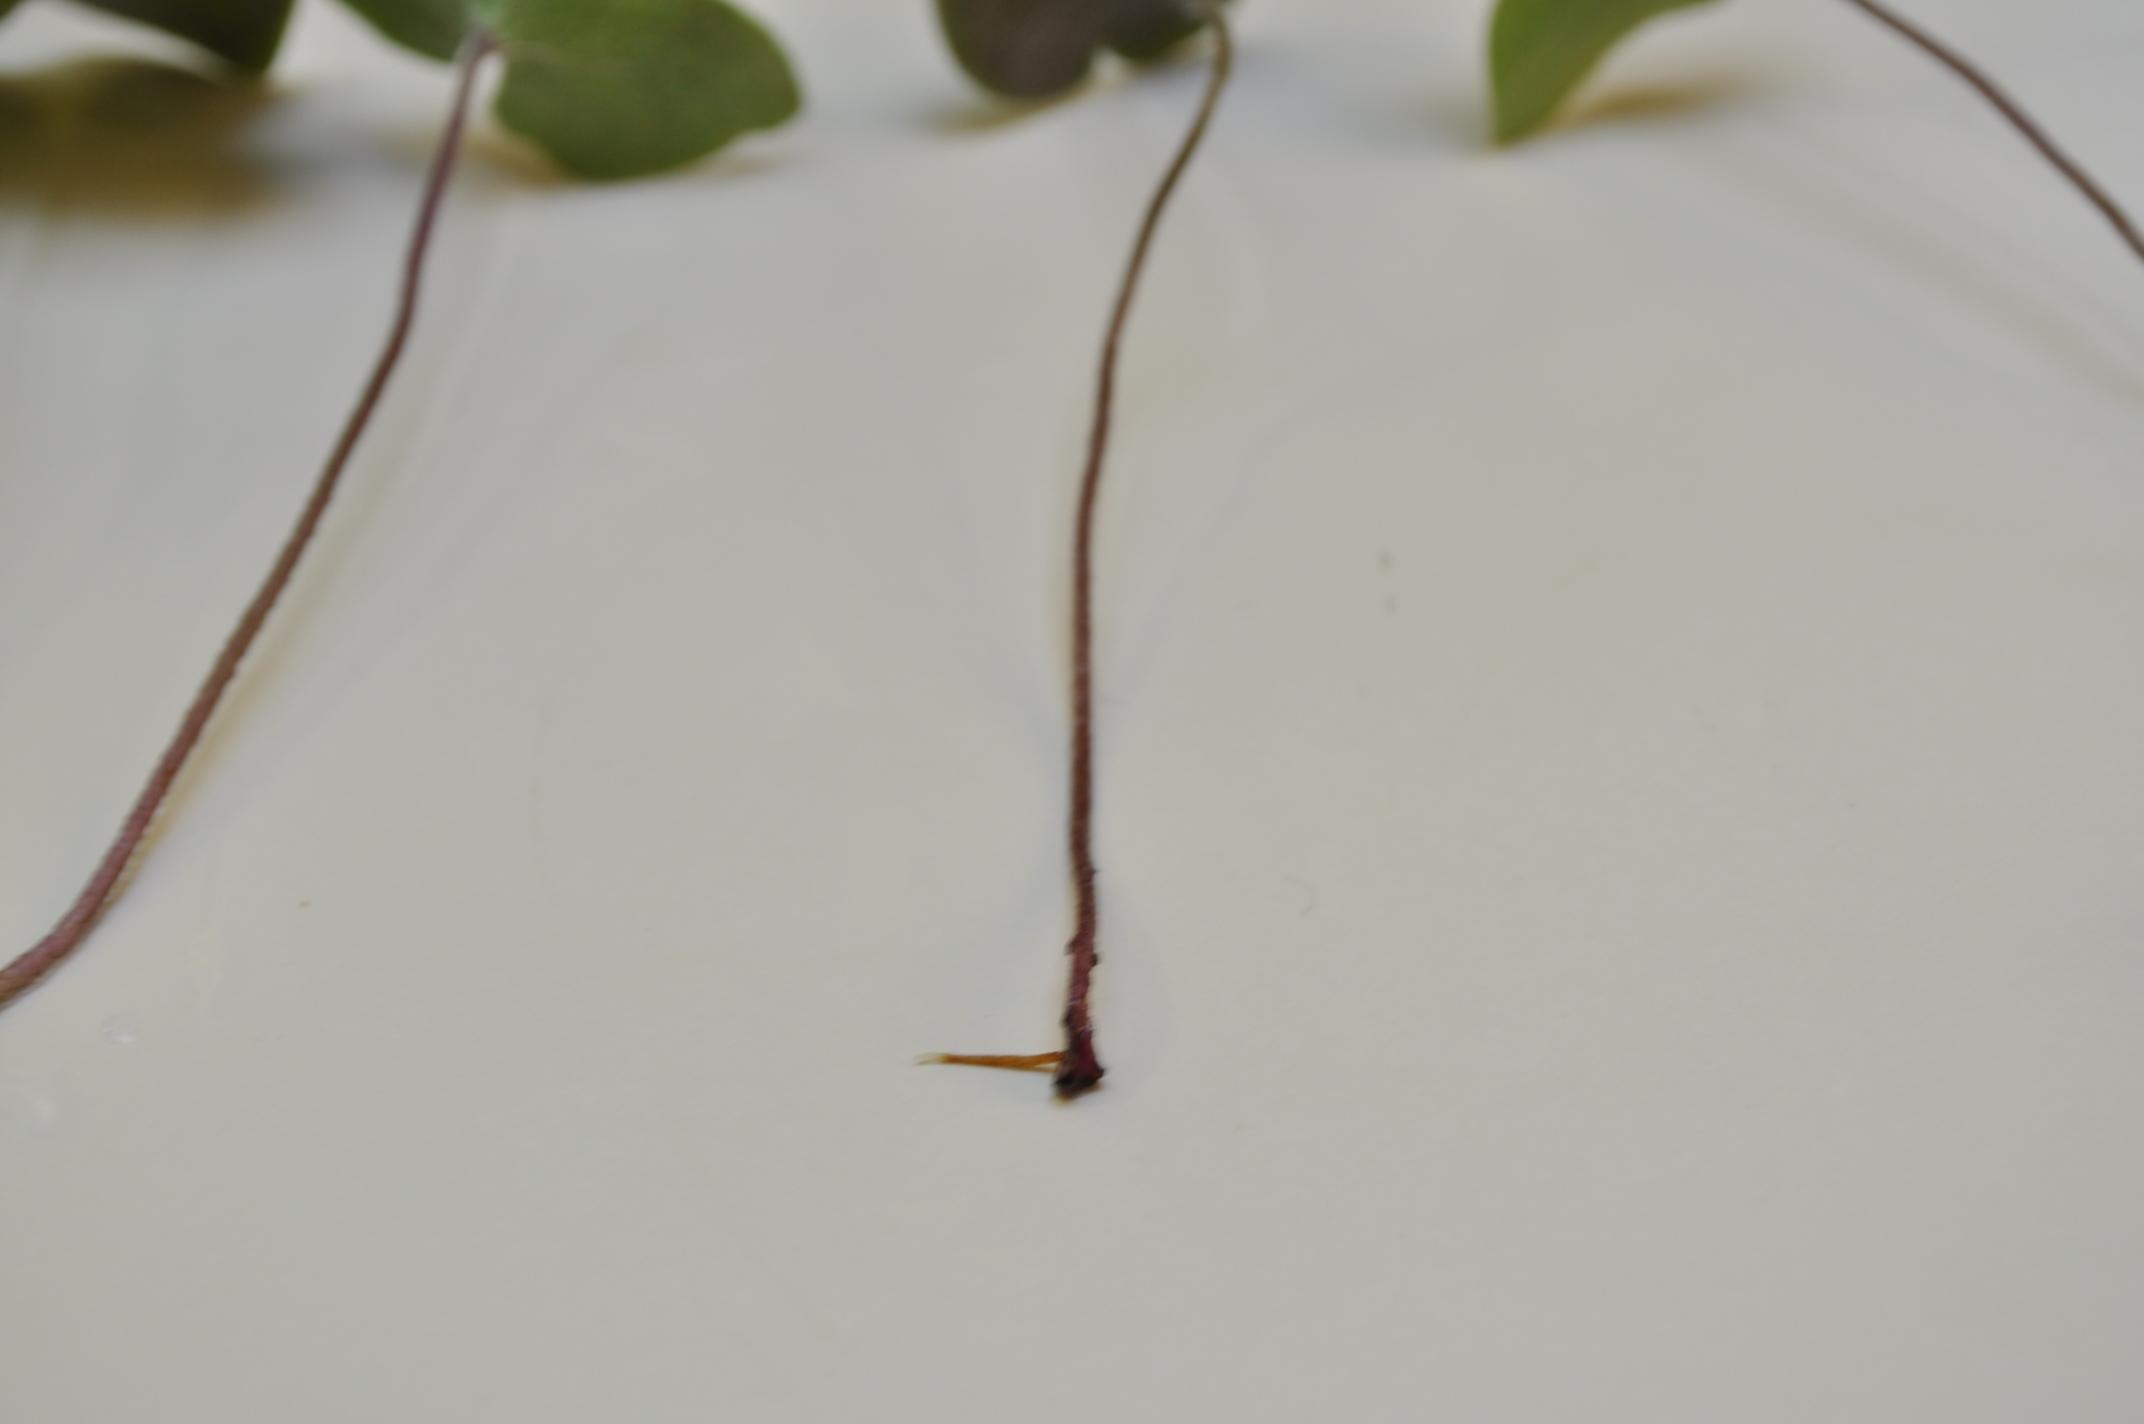 Hepatica leaf propagation